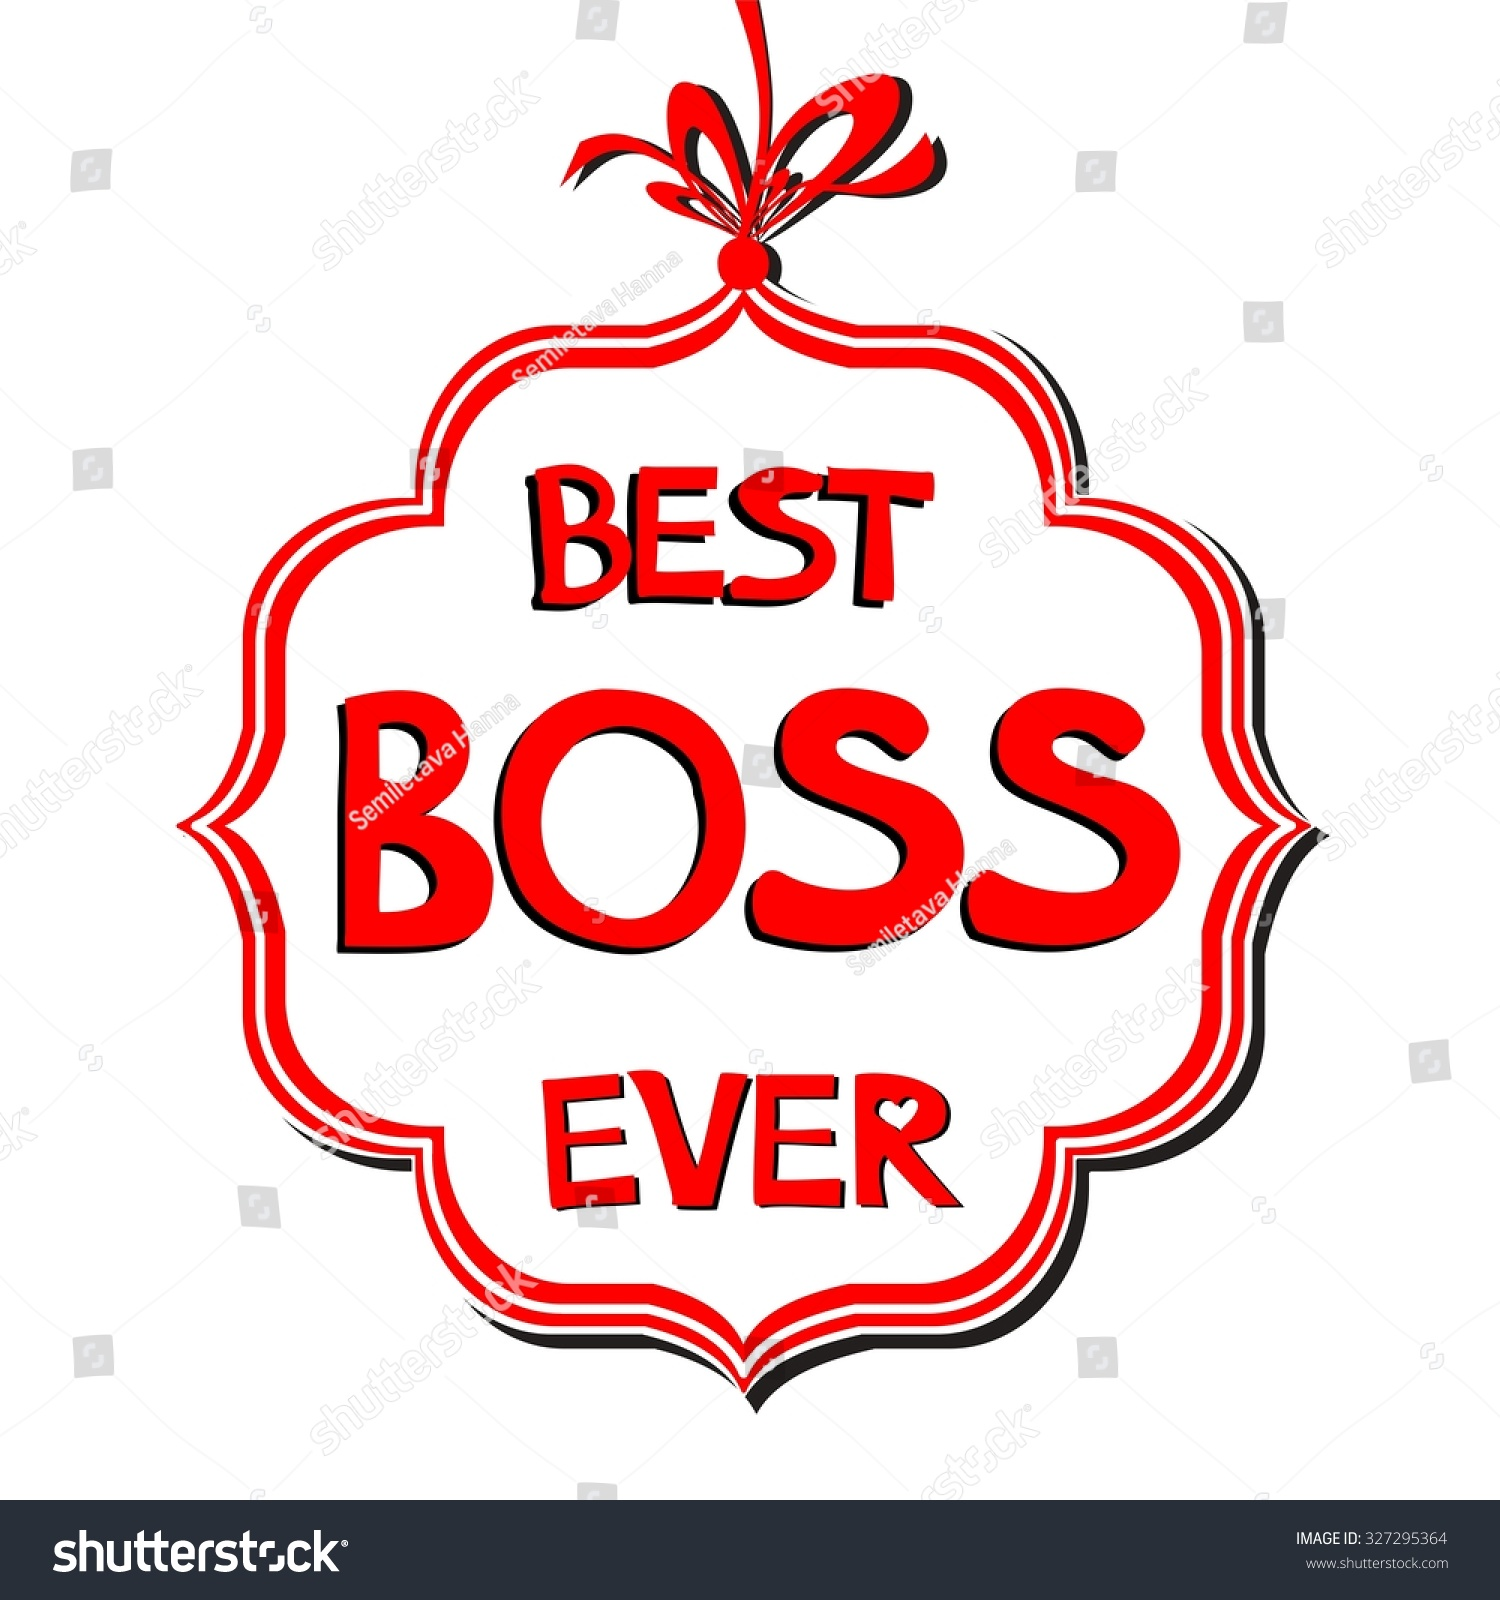 Happy Boss'S Day. Best Boss Ever. Illustration 327295364.